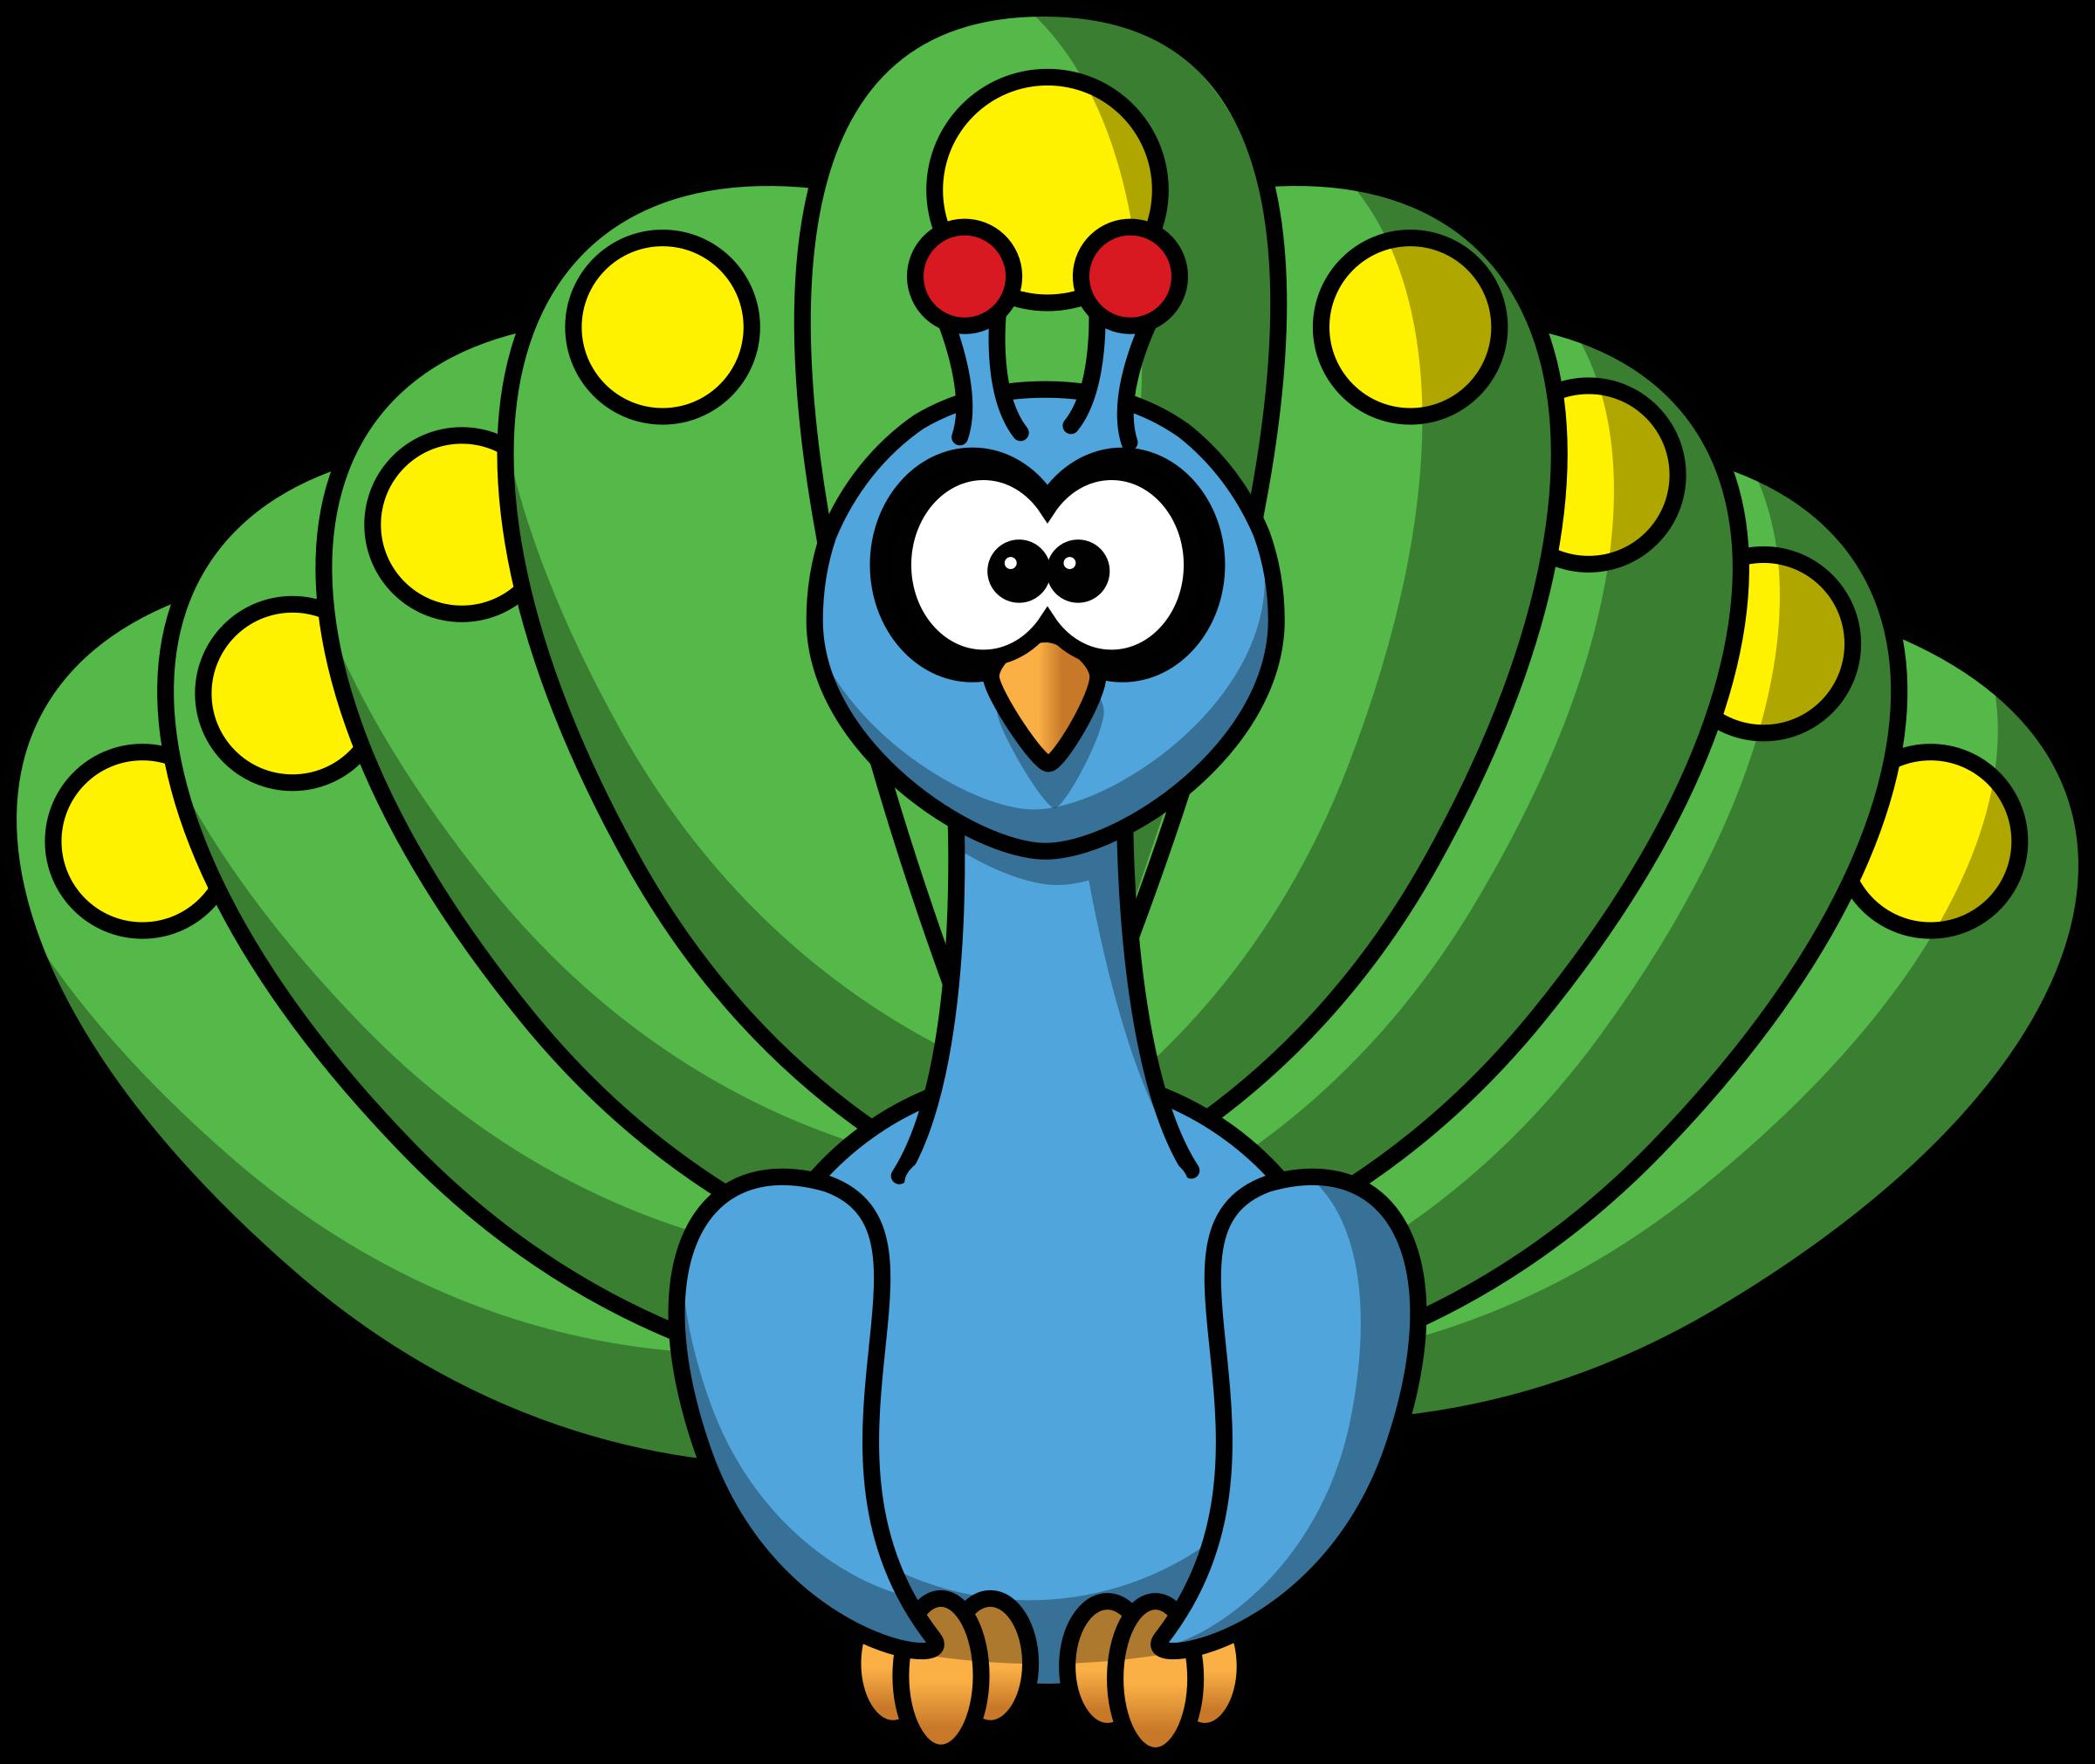 clipart freeuse stock Arcade clipart prizes. Cartoon peacock by studiofibonacci